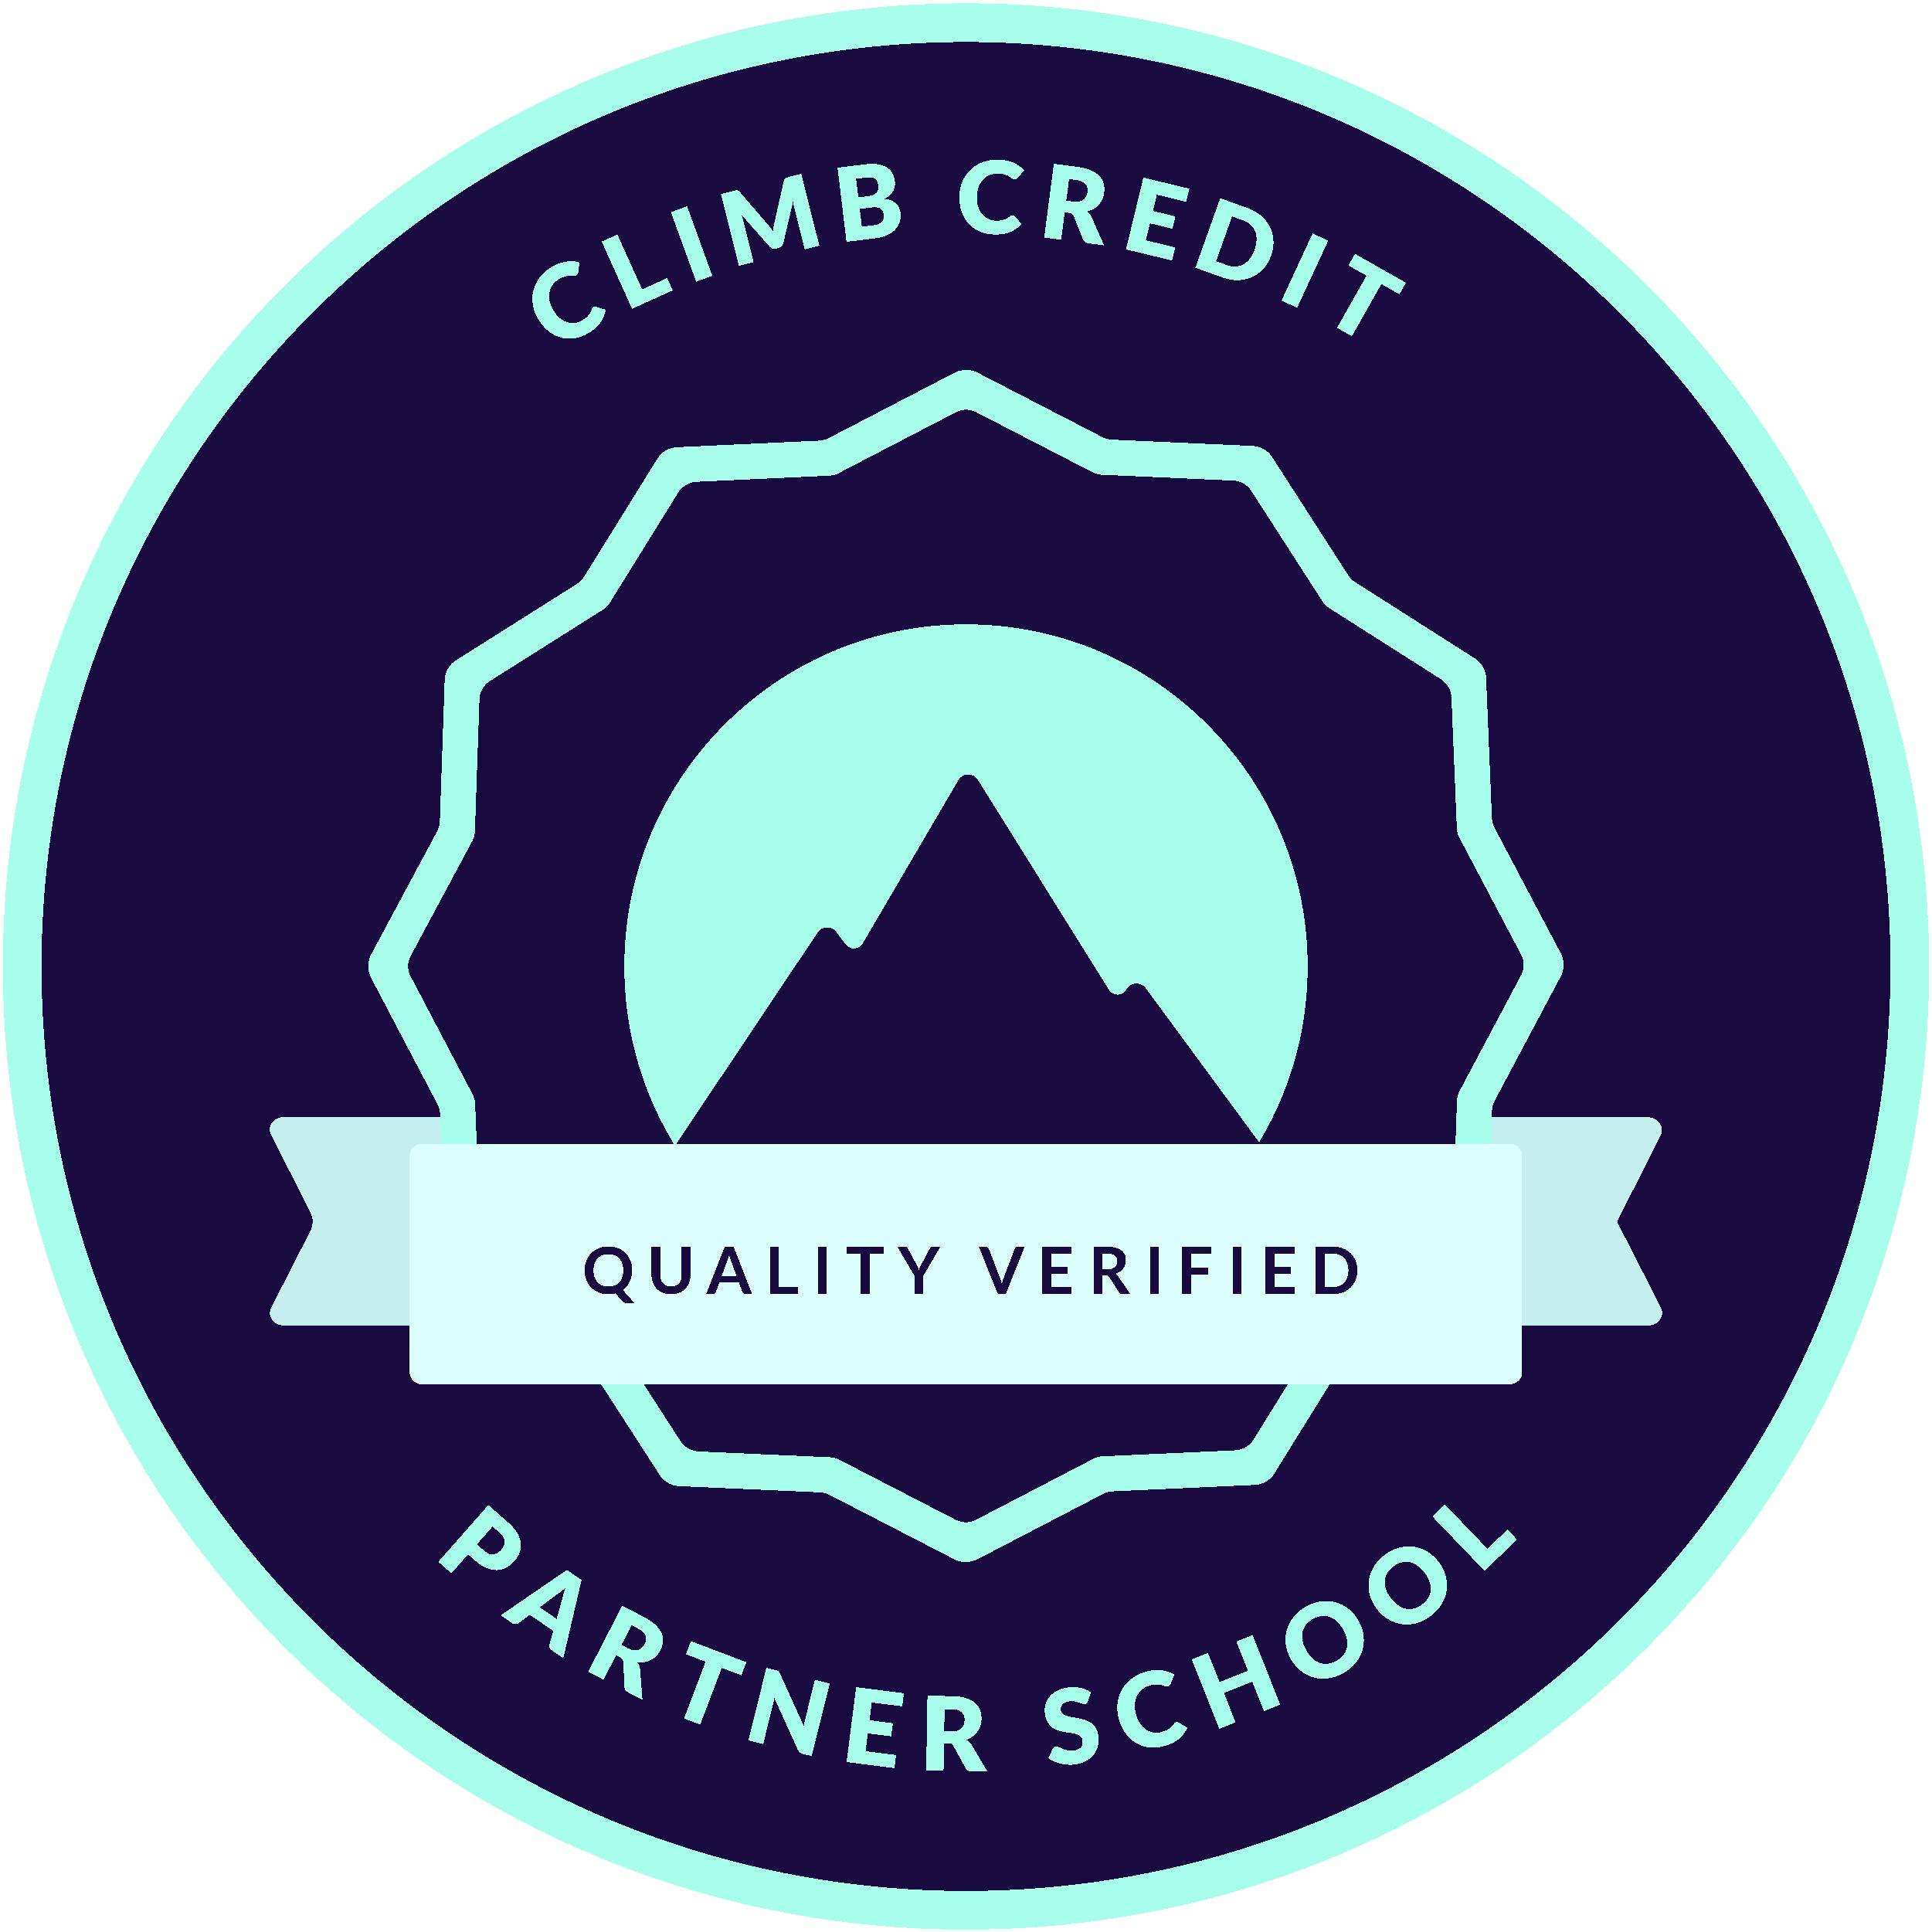 SAGE Truck Driving Schools - Climb Verified Truck Driving School